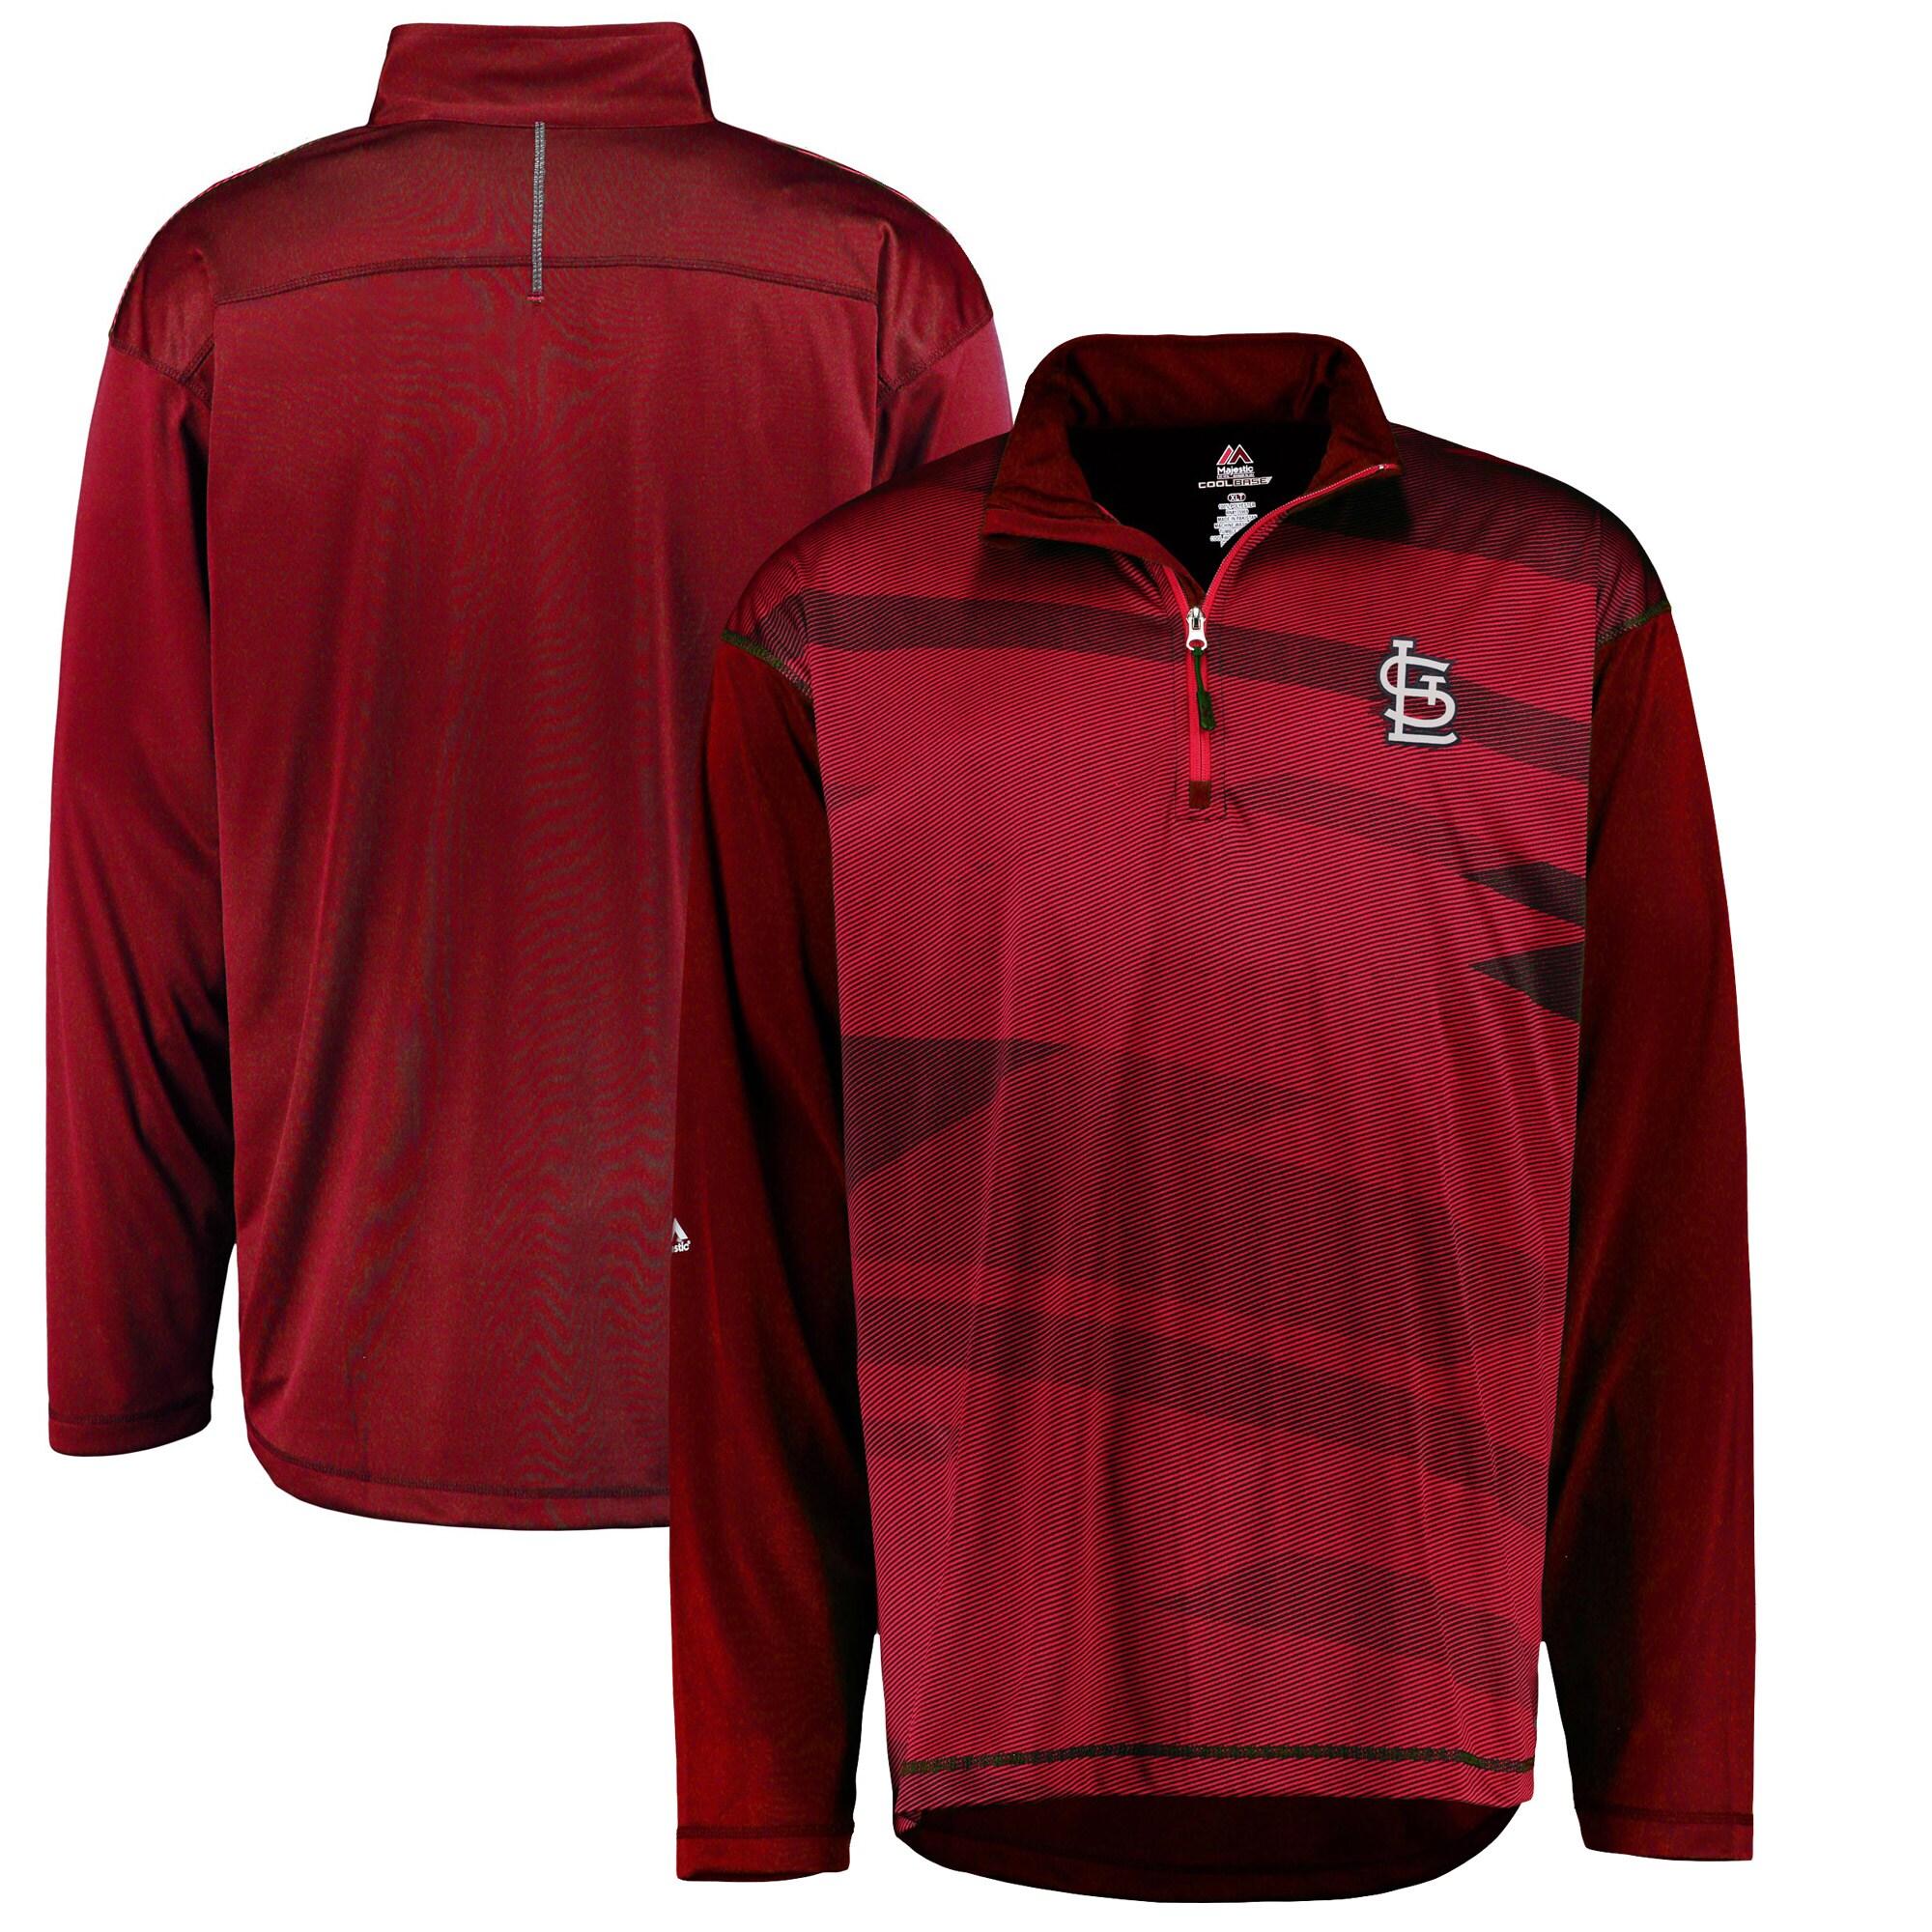 St. Louis Cardinals Majestic Big & Tall Cool Base Quarter-Zip Sweatshirt - Red/Navy